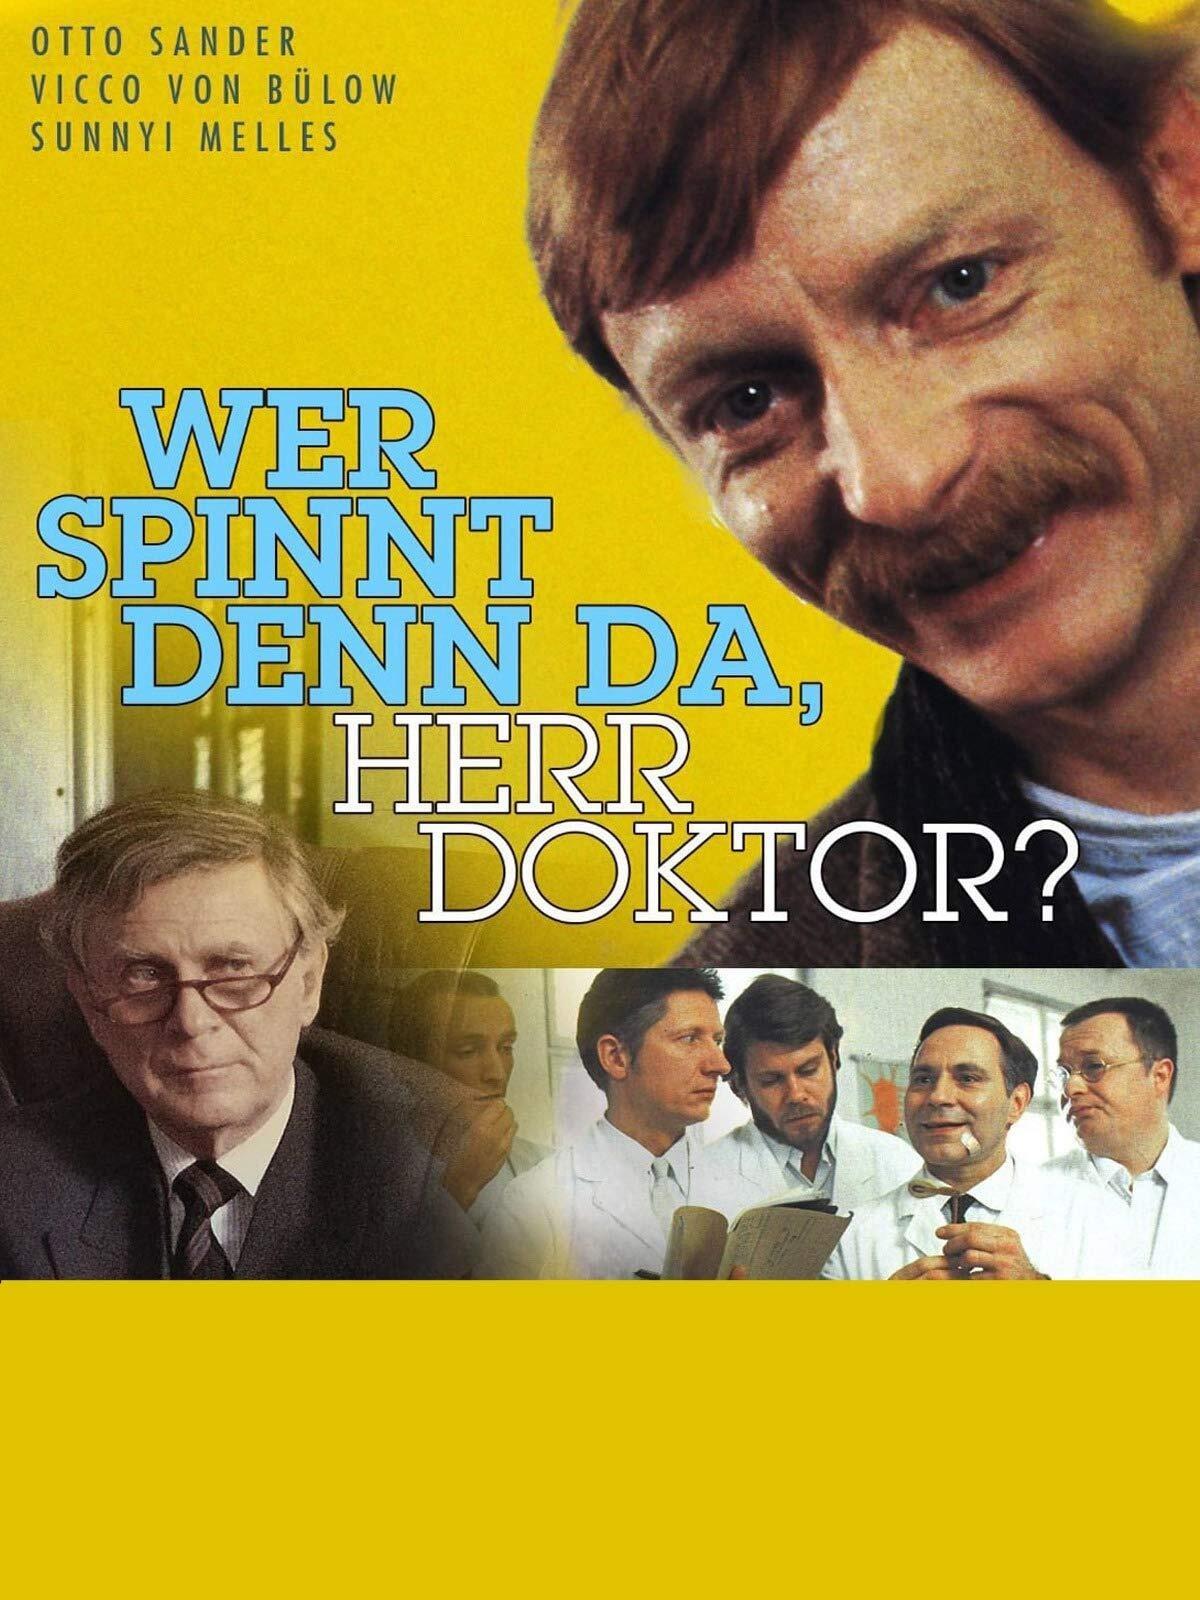 Wer spinnt denn da, Herr Doktor?